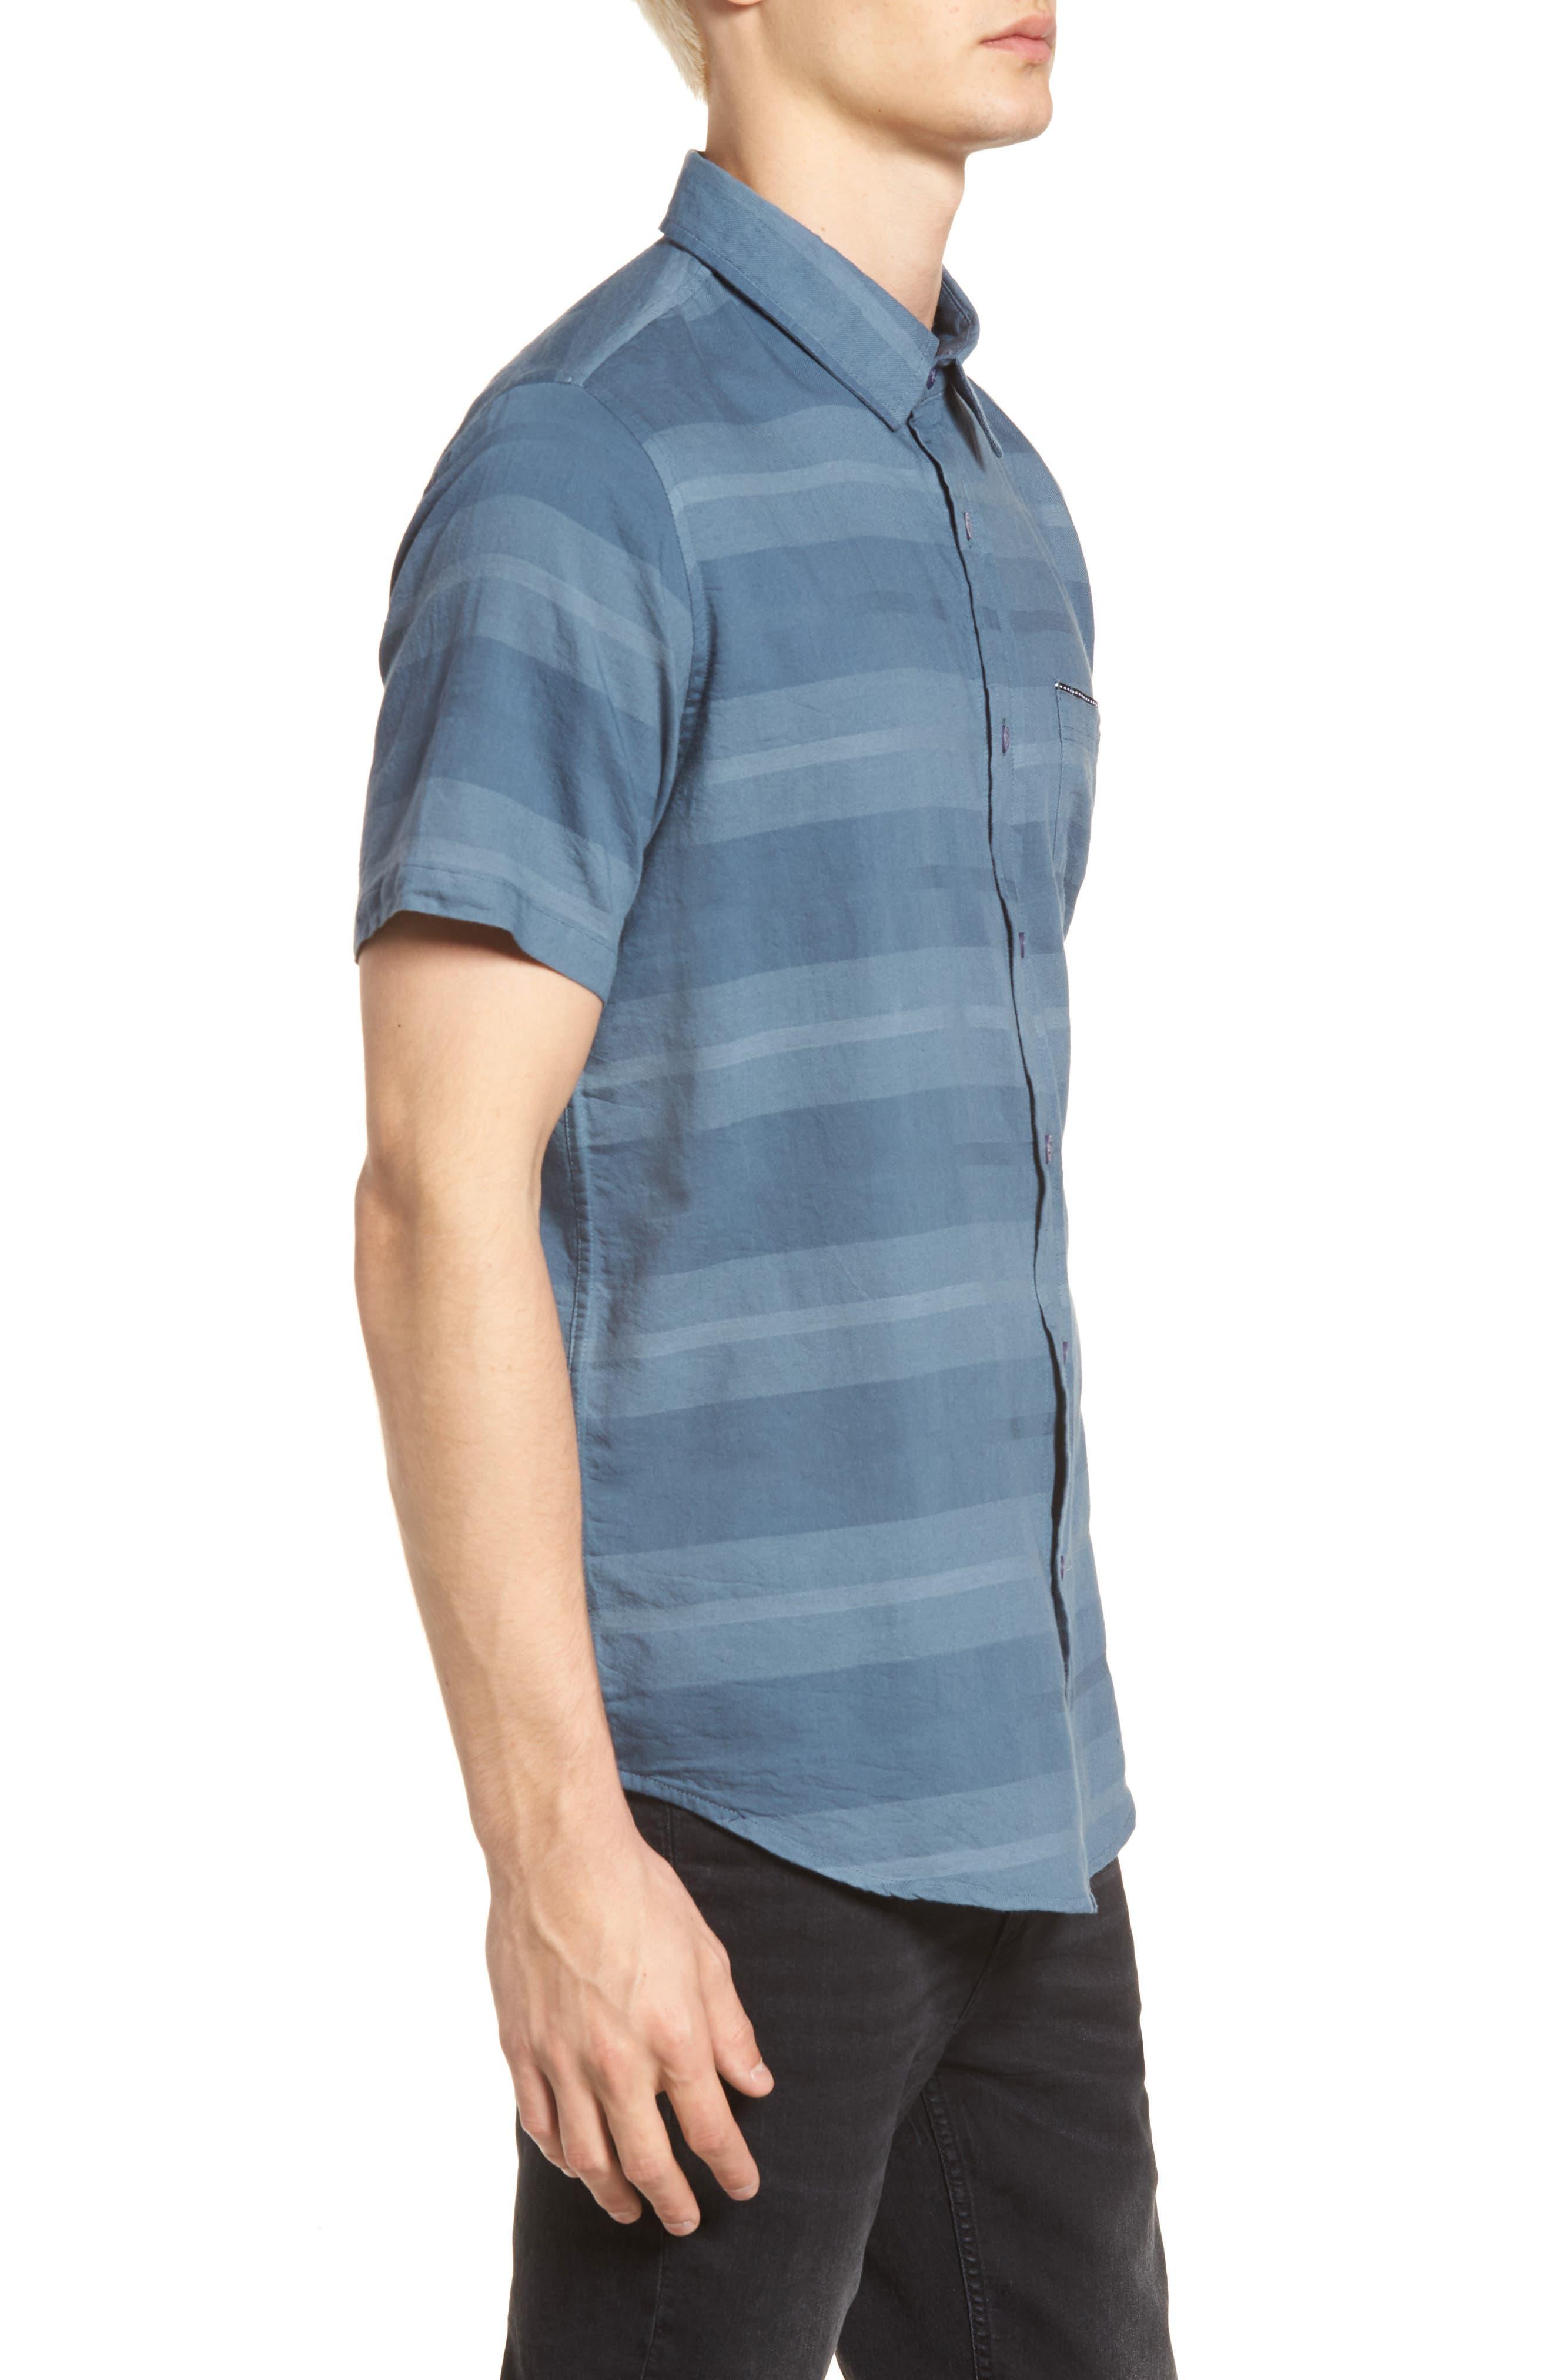 Dobson Woven Shirt,                             Alternate thumbnail 4, color,                             Storm Blue/Prison Blue Stripe